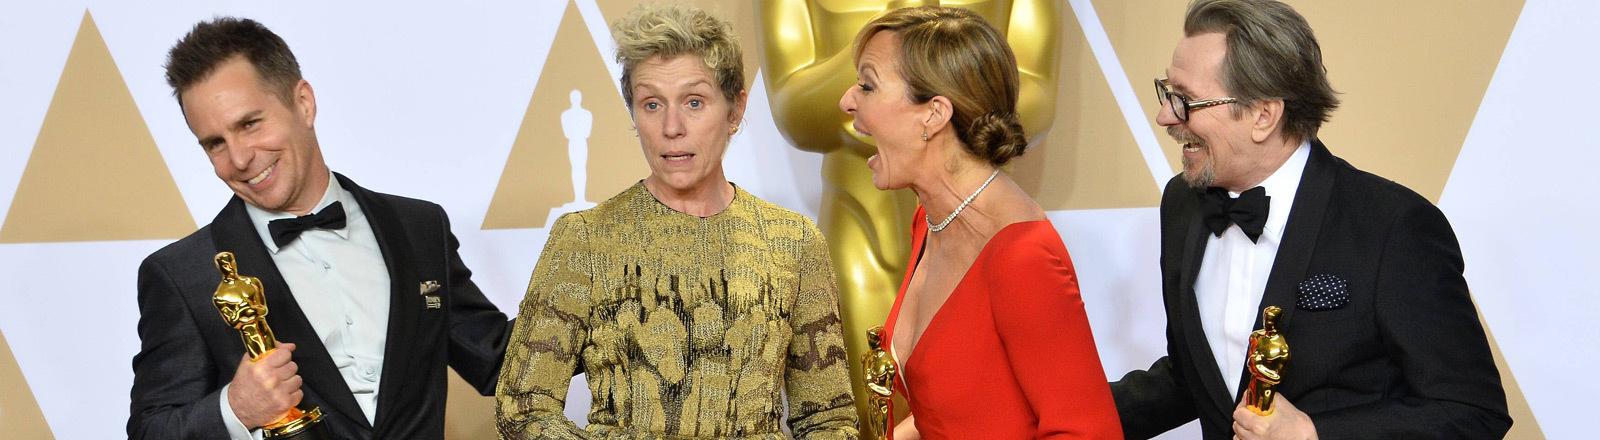 Vier Oscar-Gewinner 2018 beim Photocall.